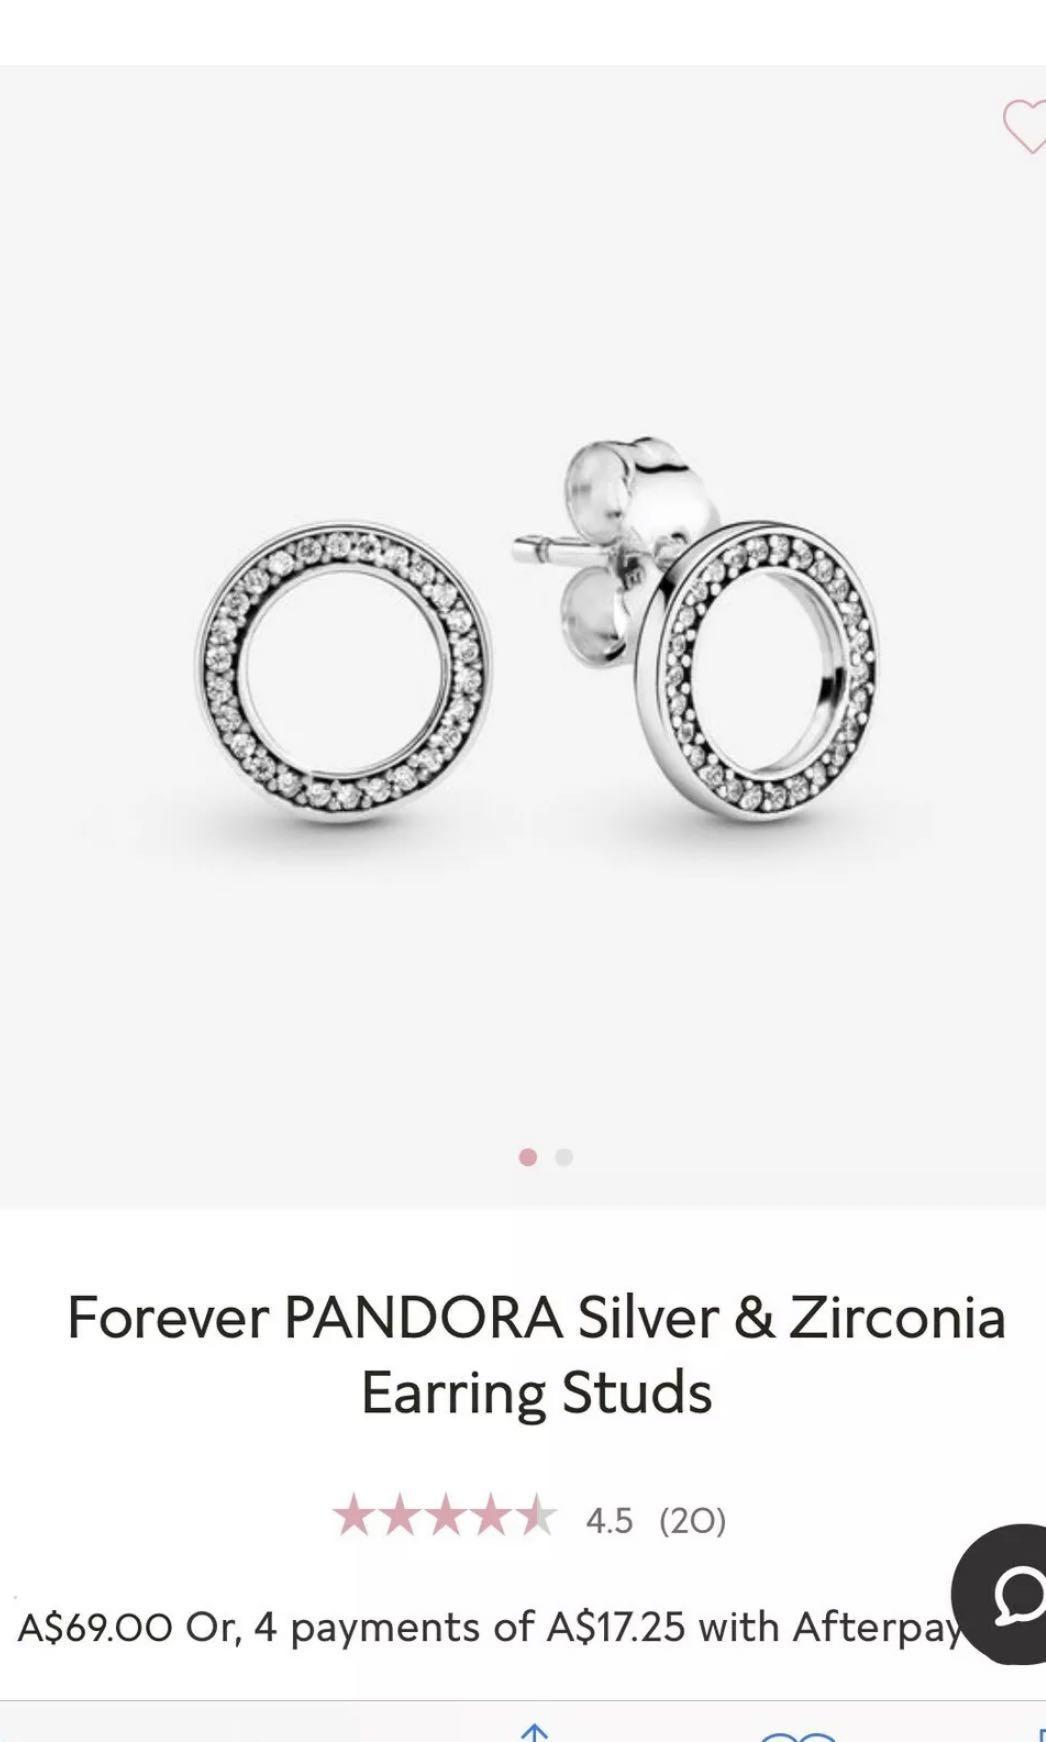 Pandora - forever pandora silver & zirconia earring studs